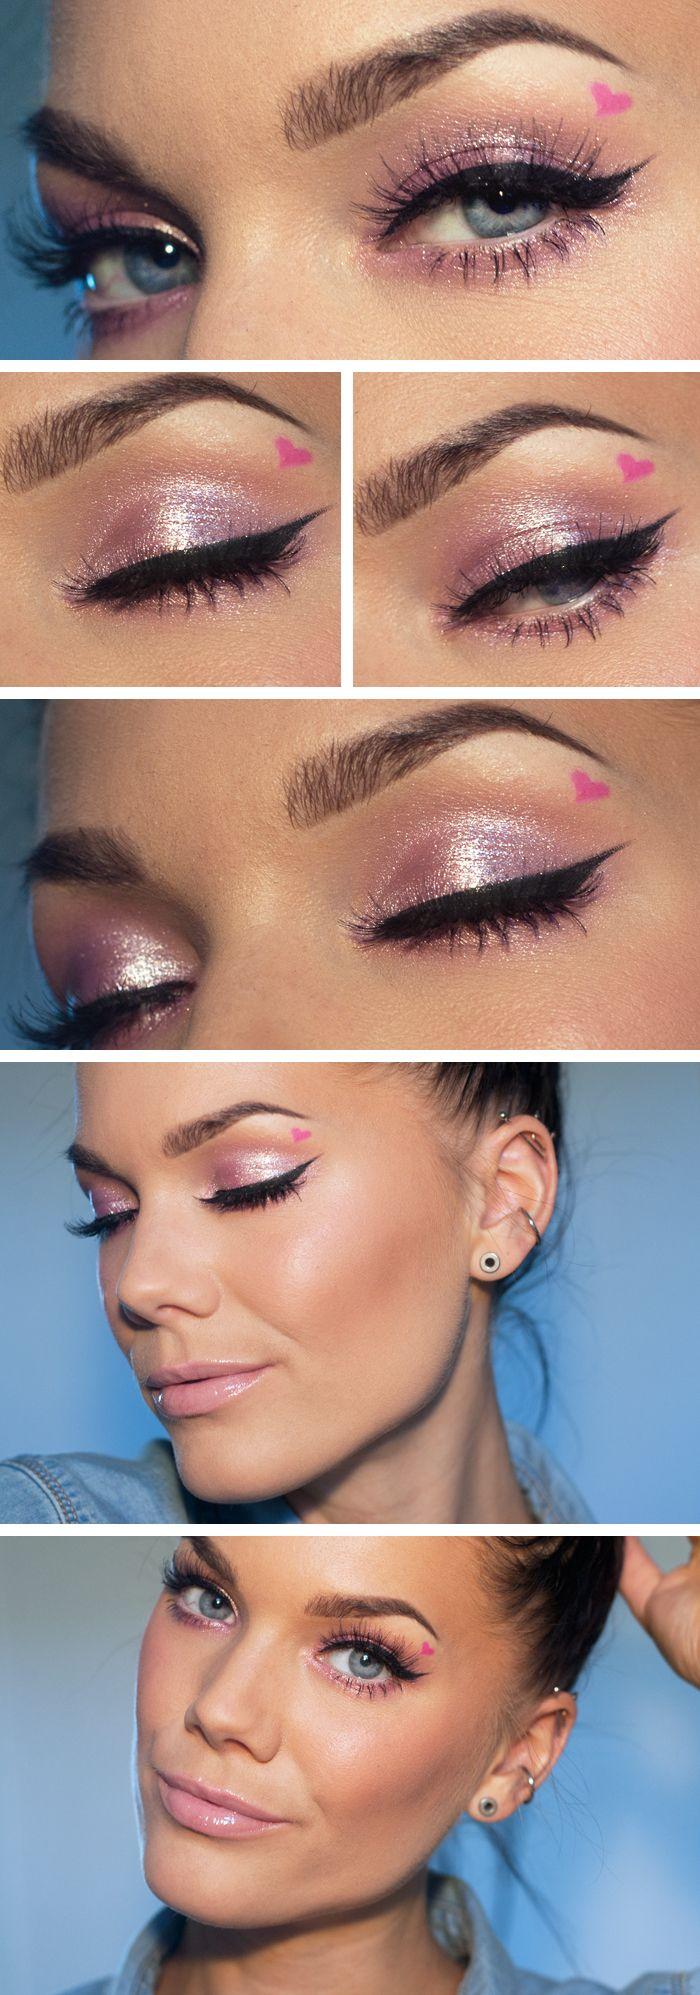 Valentine's day Makeup Tutorial http://pinmakeuptips.com/valentines-day-makeup-tutorial/